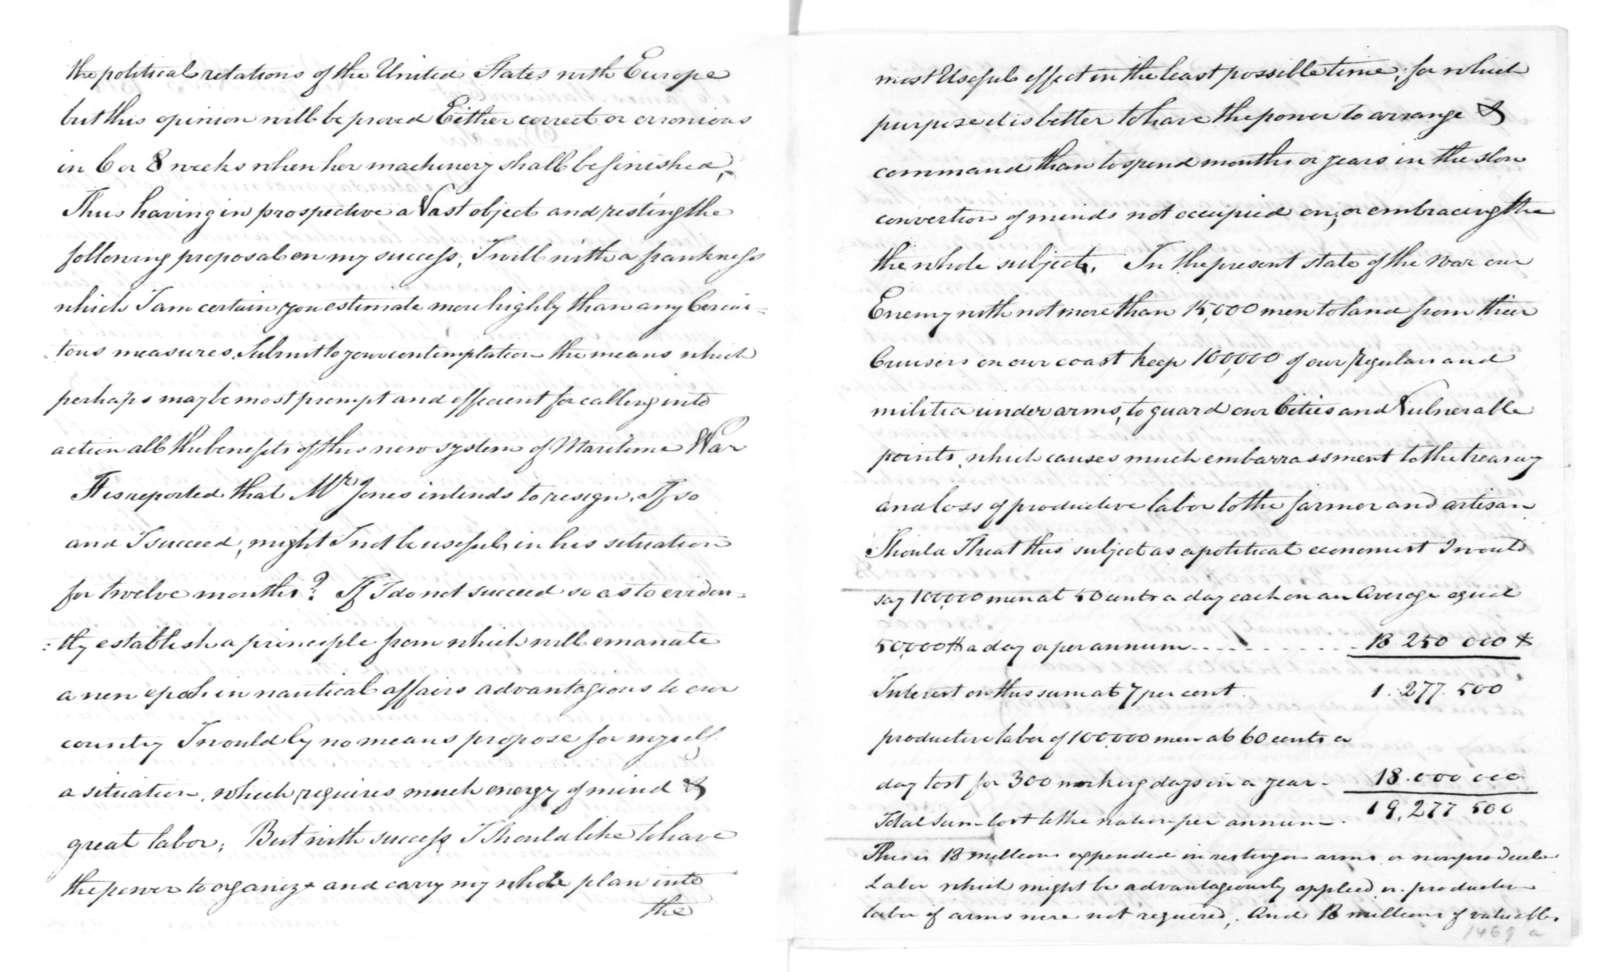 Robert Fulton to James Madison, November 5, 1814.